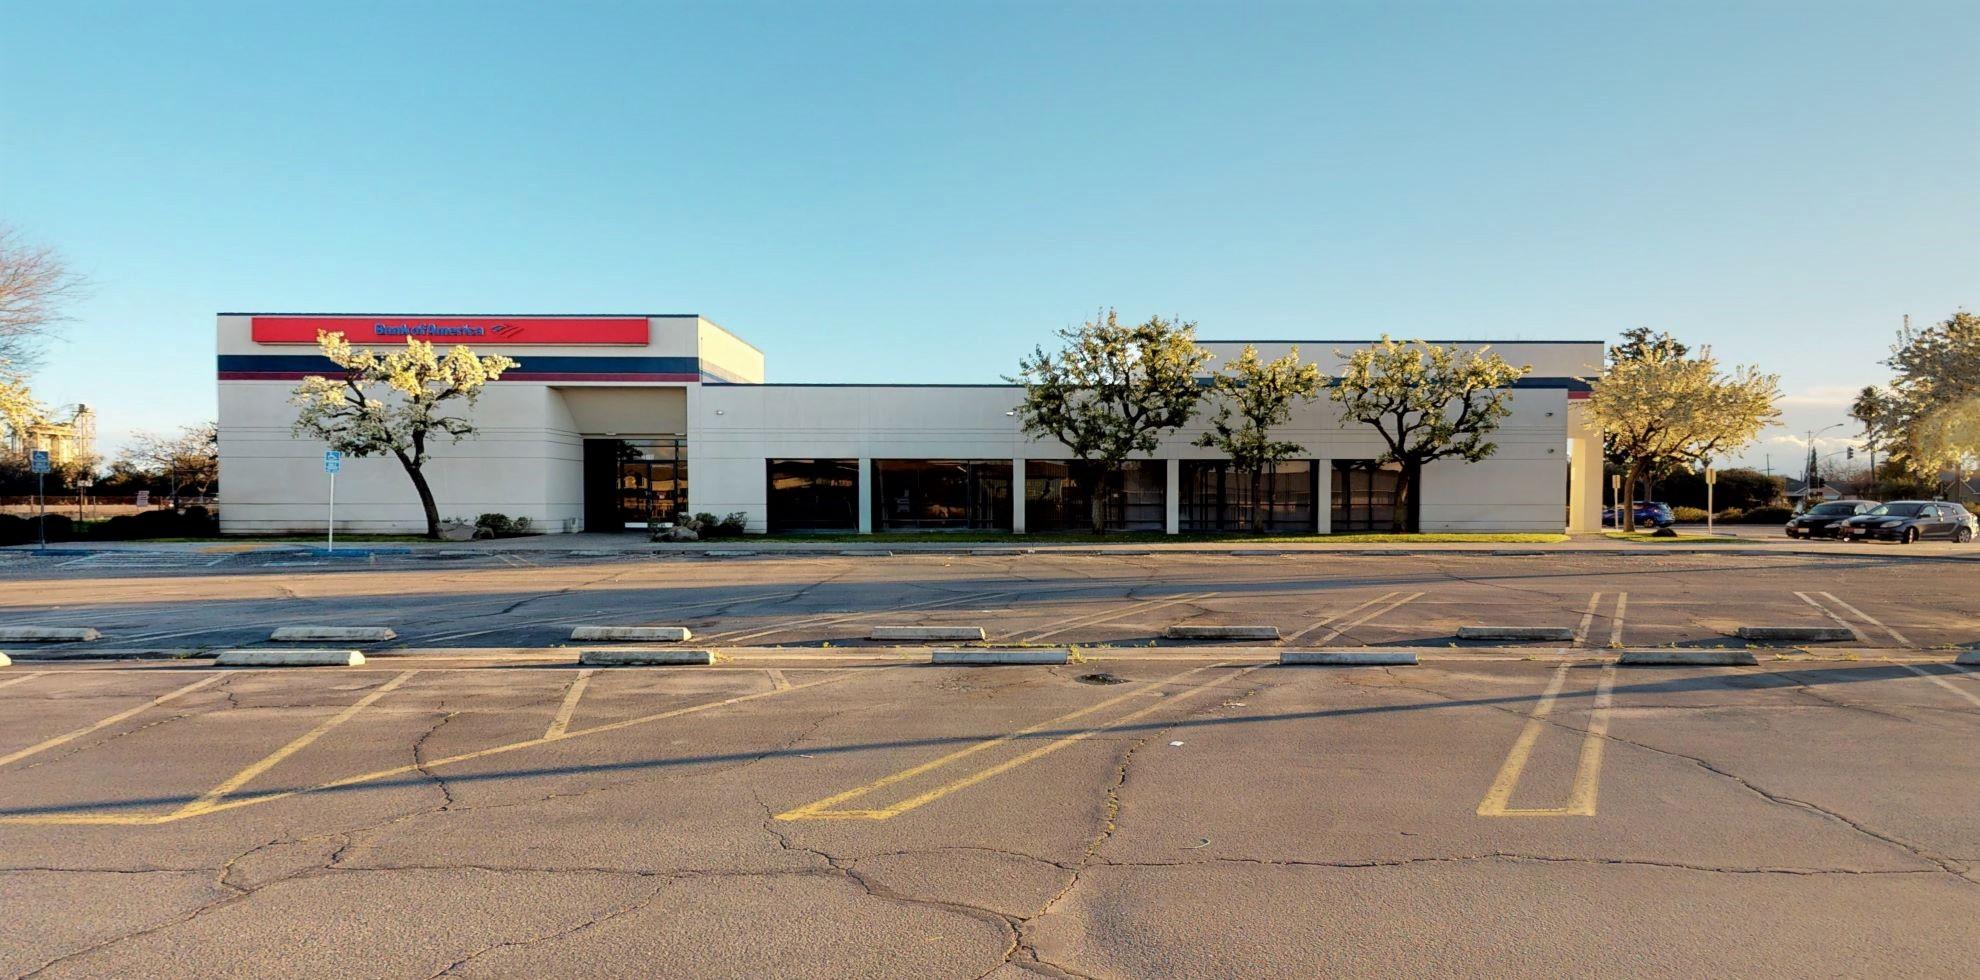 Bank of America financial center with walk-up ATM | 2611 S Cedar Ave, Fresno, CA 93725